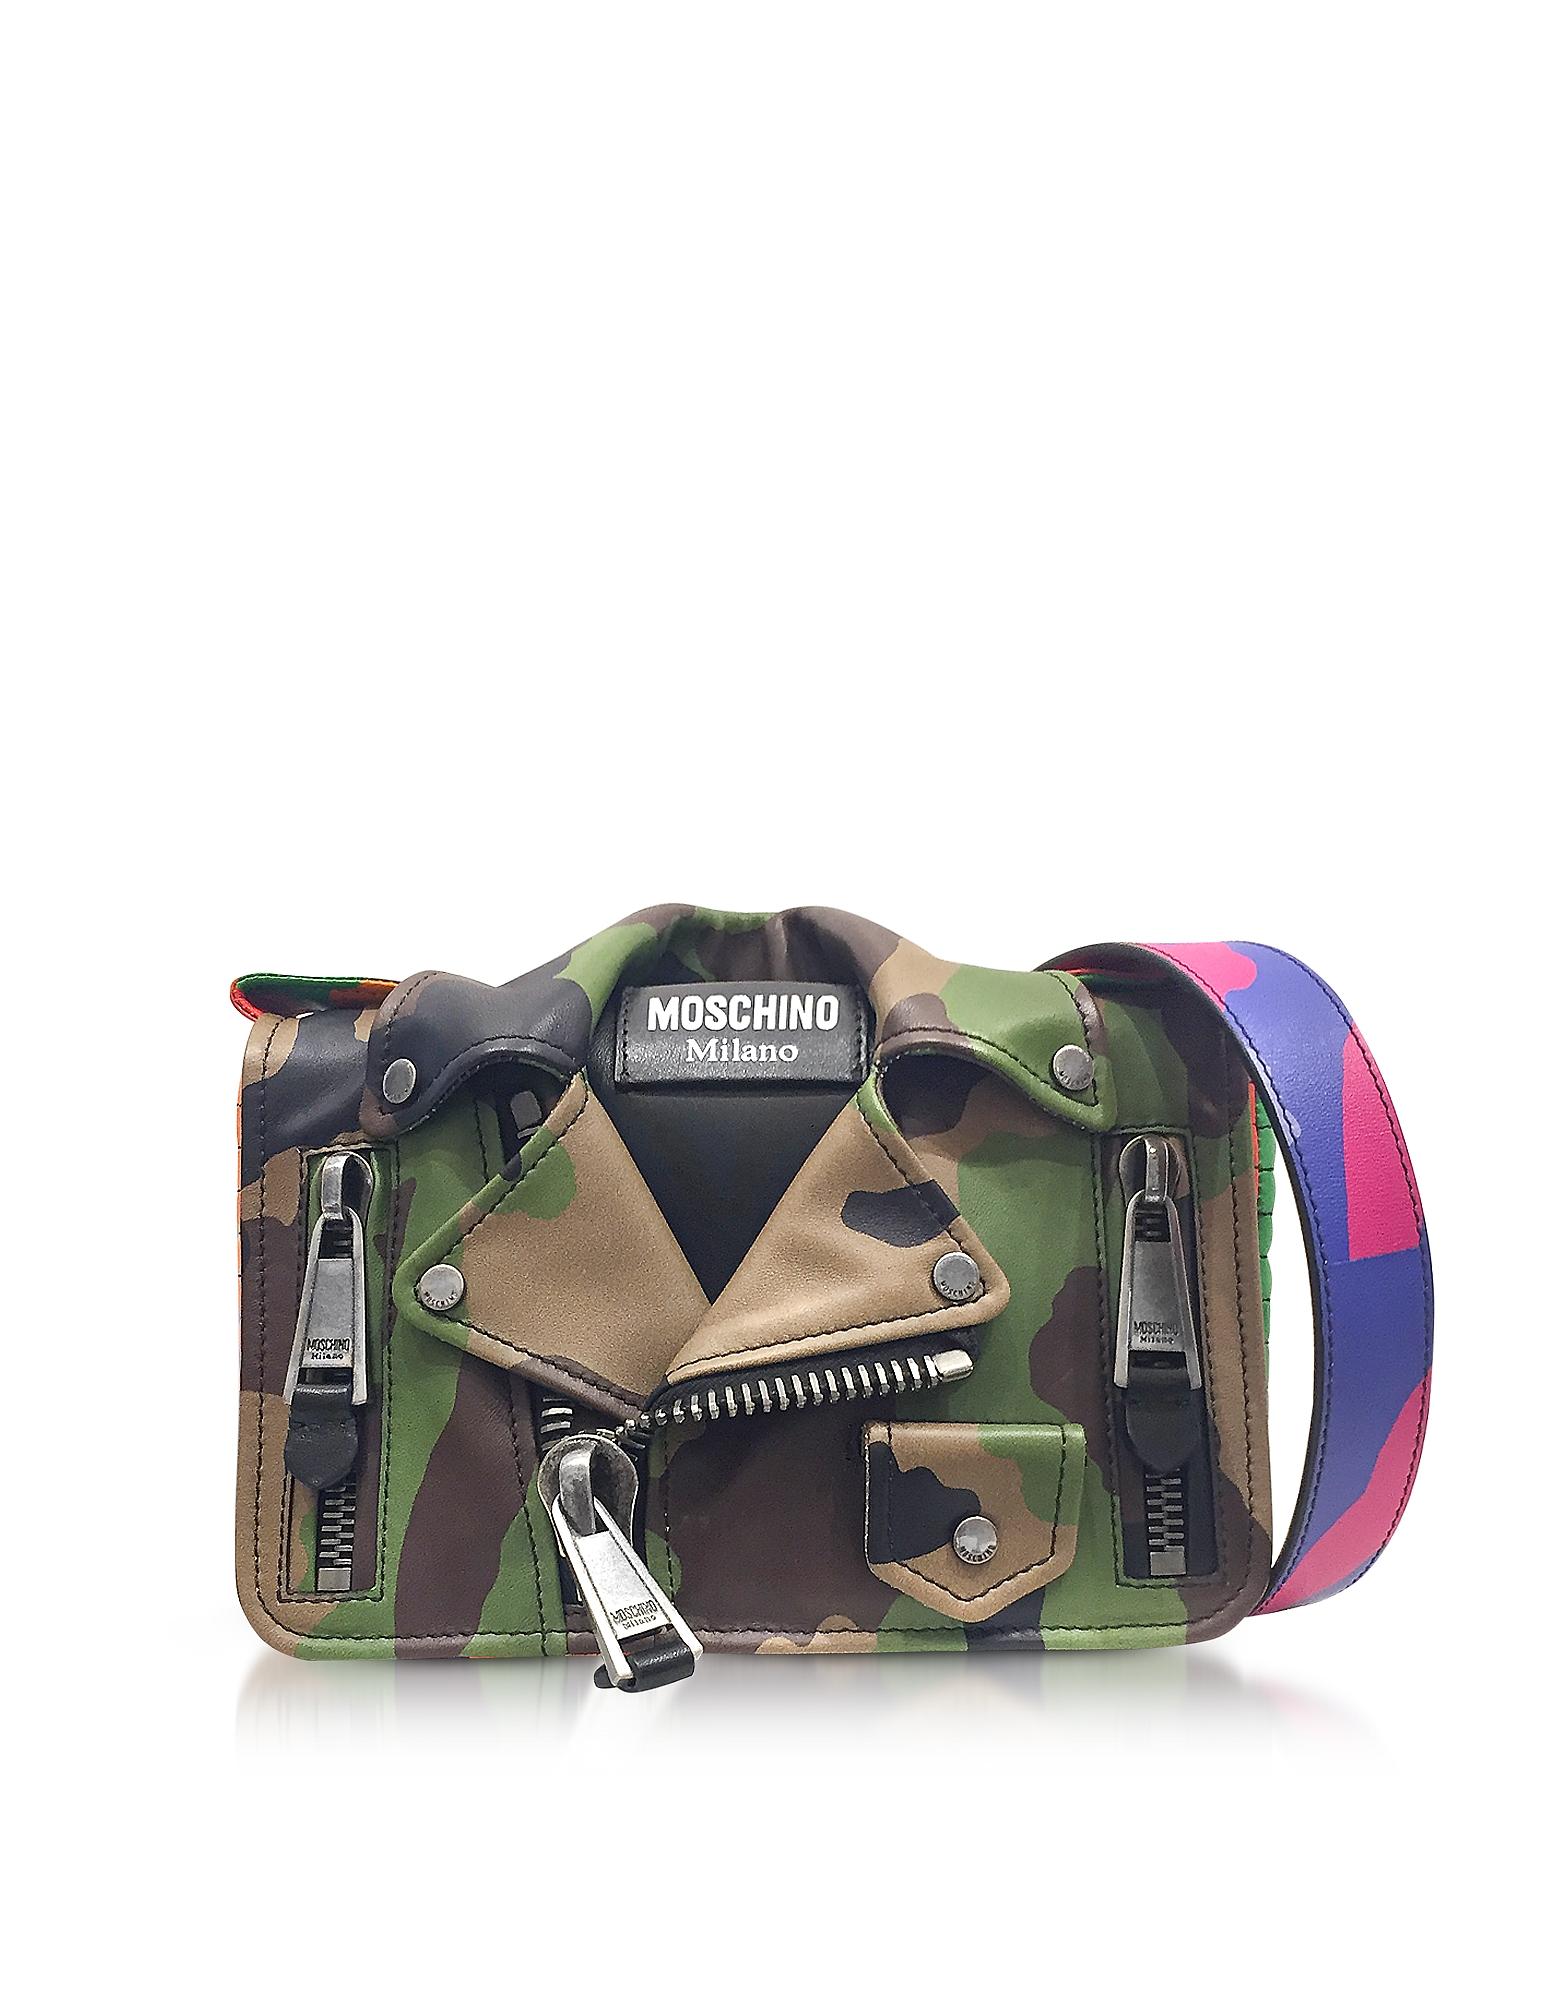 Moschino Handbags, Camo Biker Jacket Printed Leather Shoulder Bag